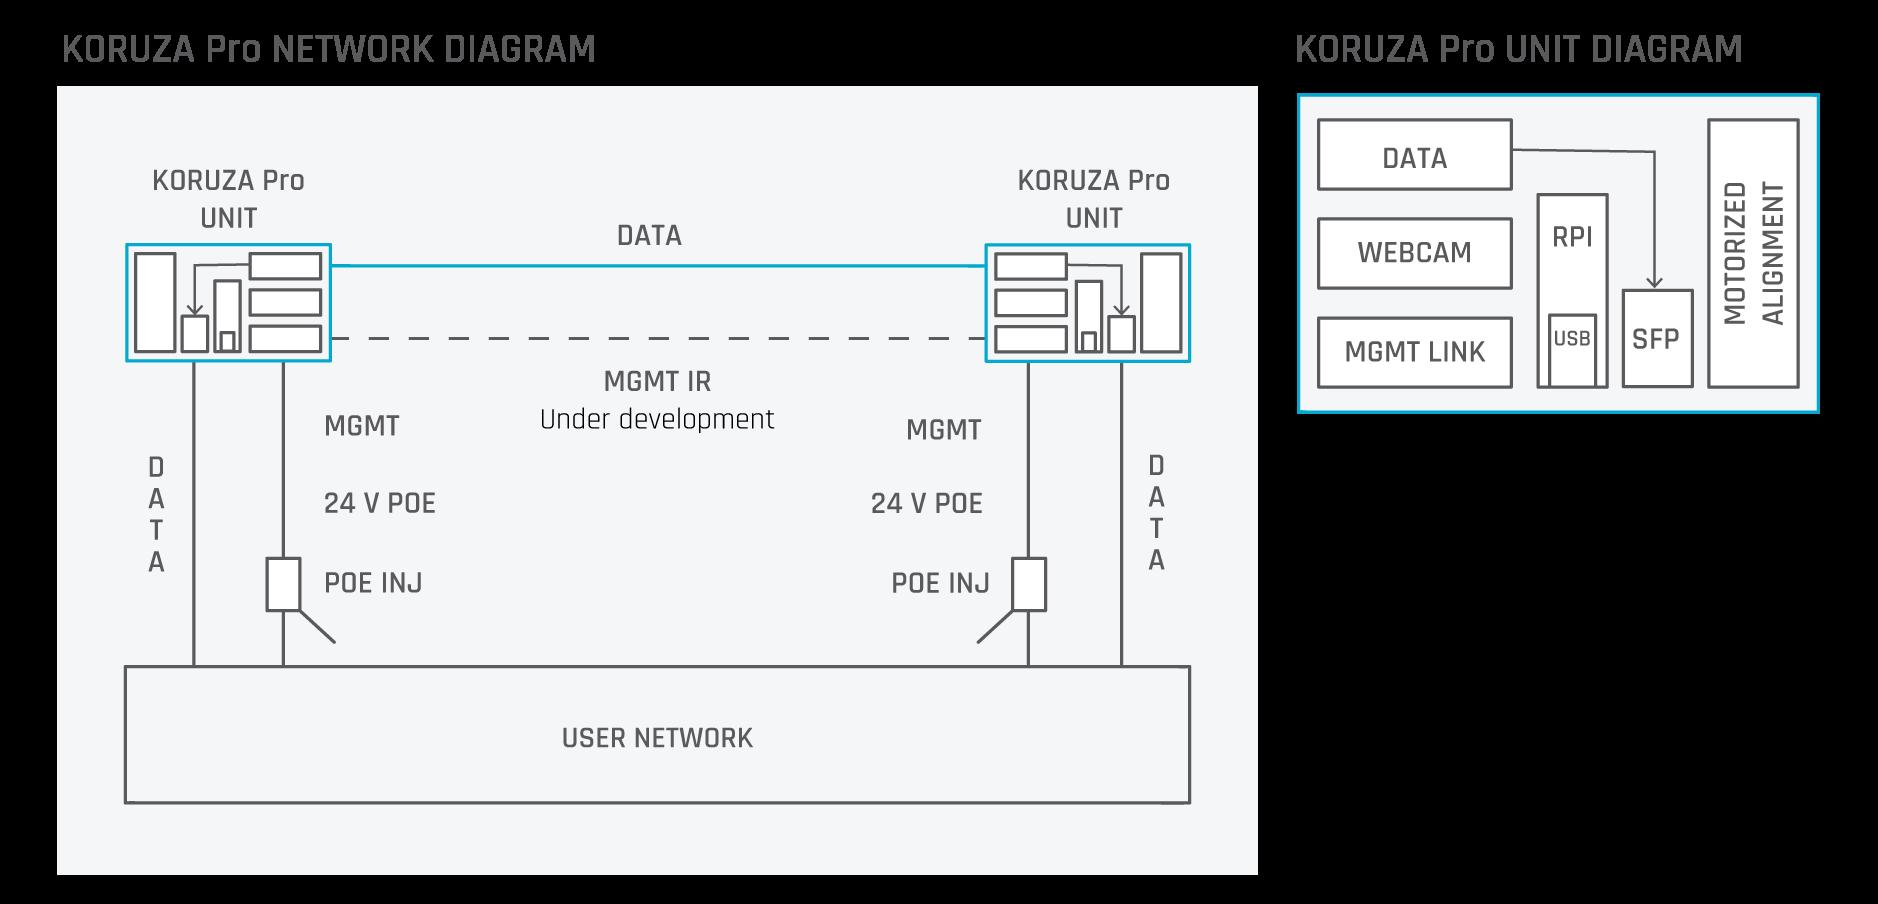 KORUZA Pro Network Diagram